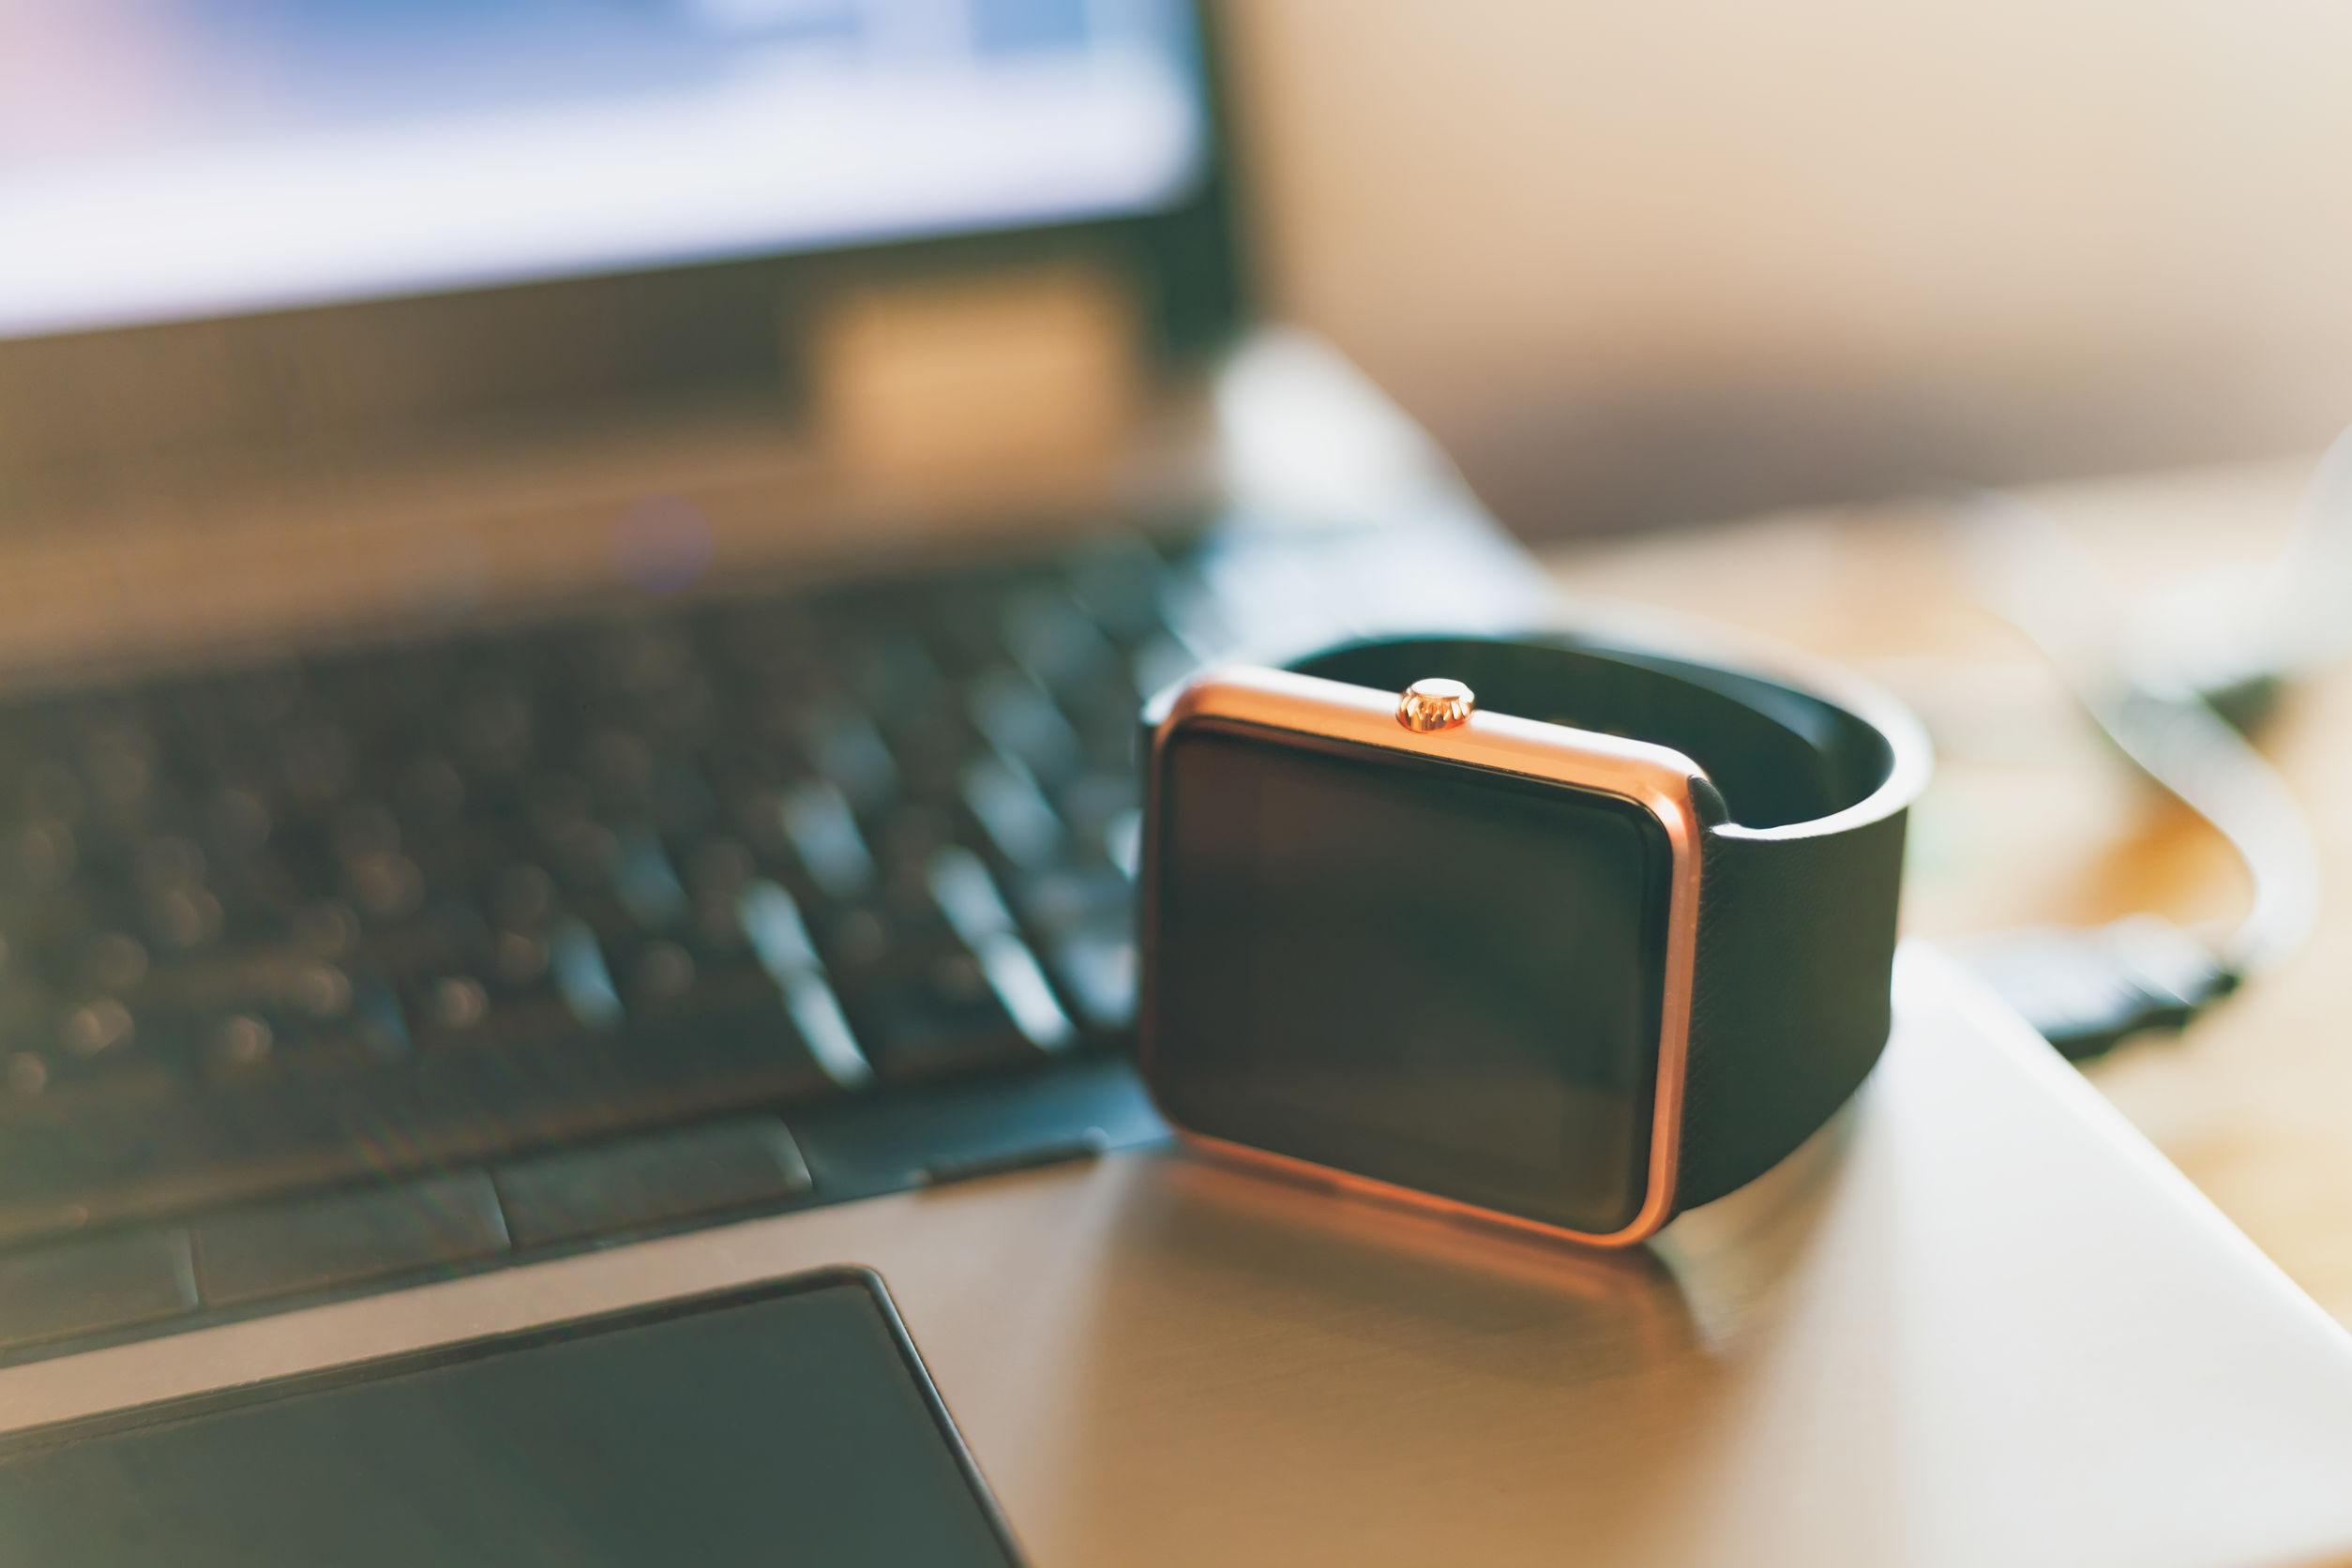 Reloj de pulsera elegante moderno que sobre notebook